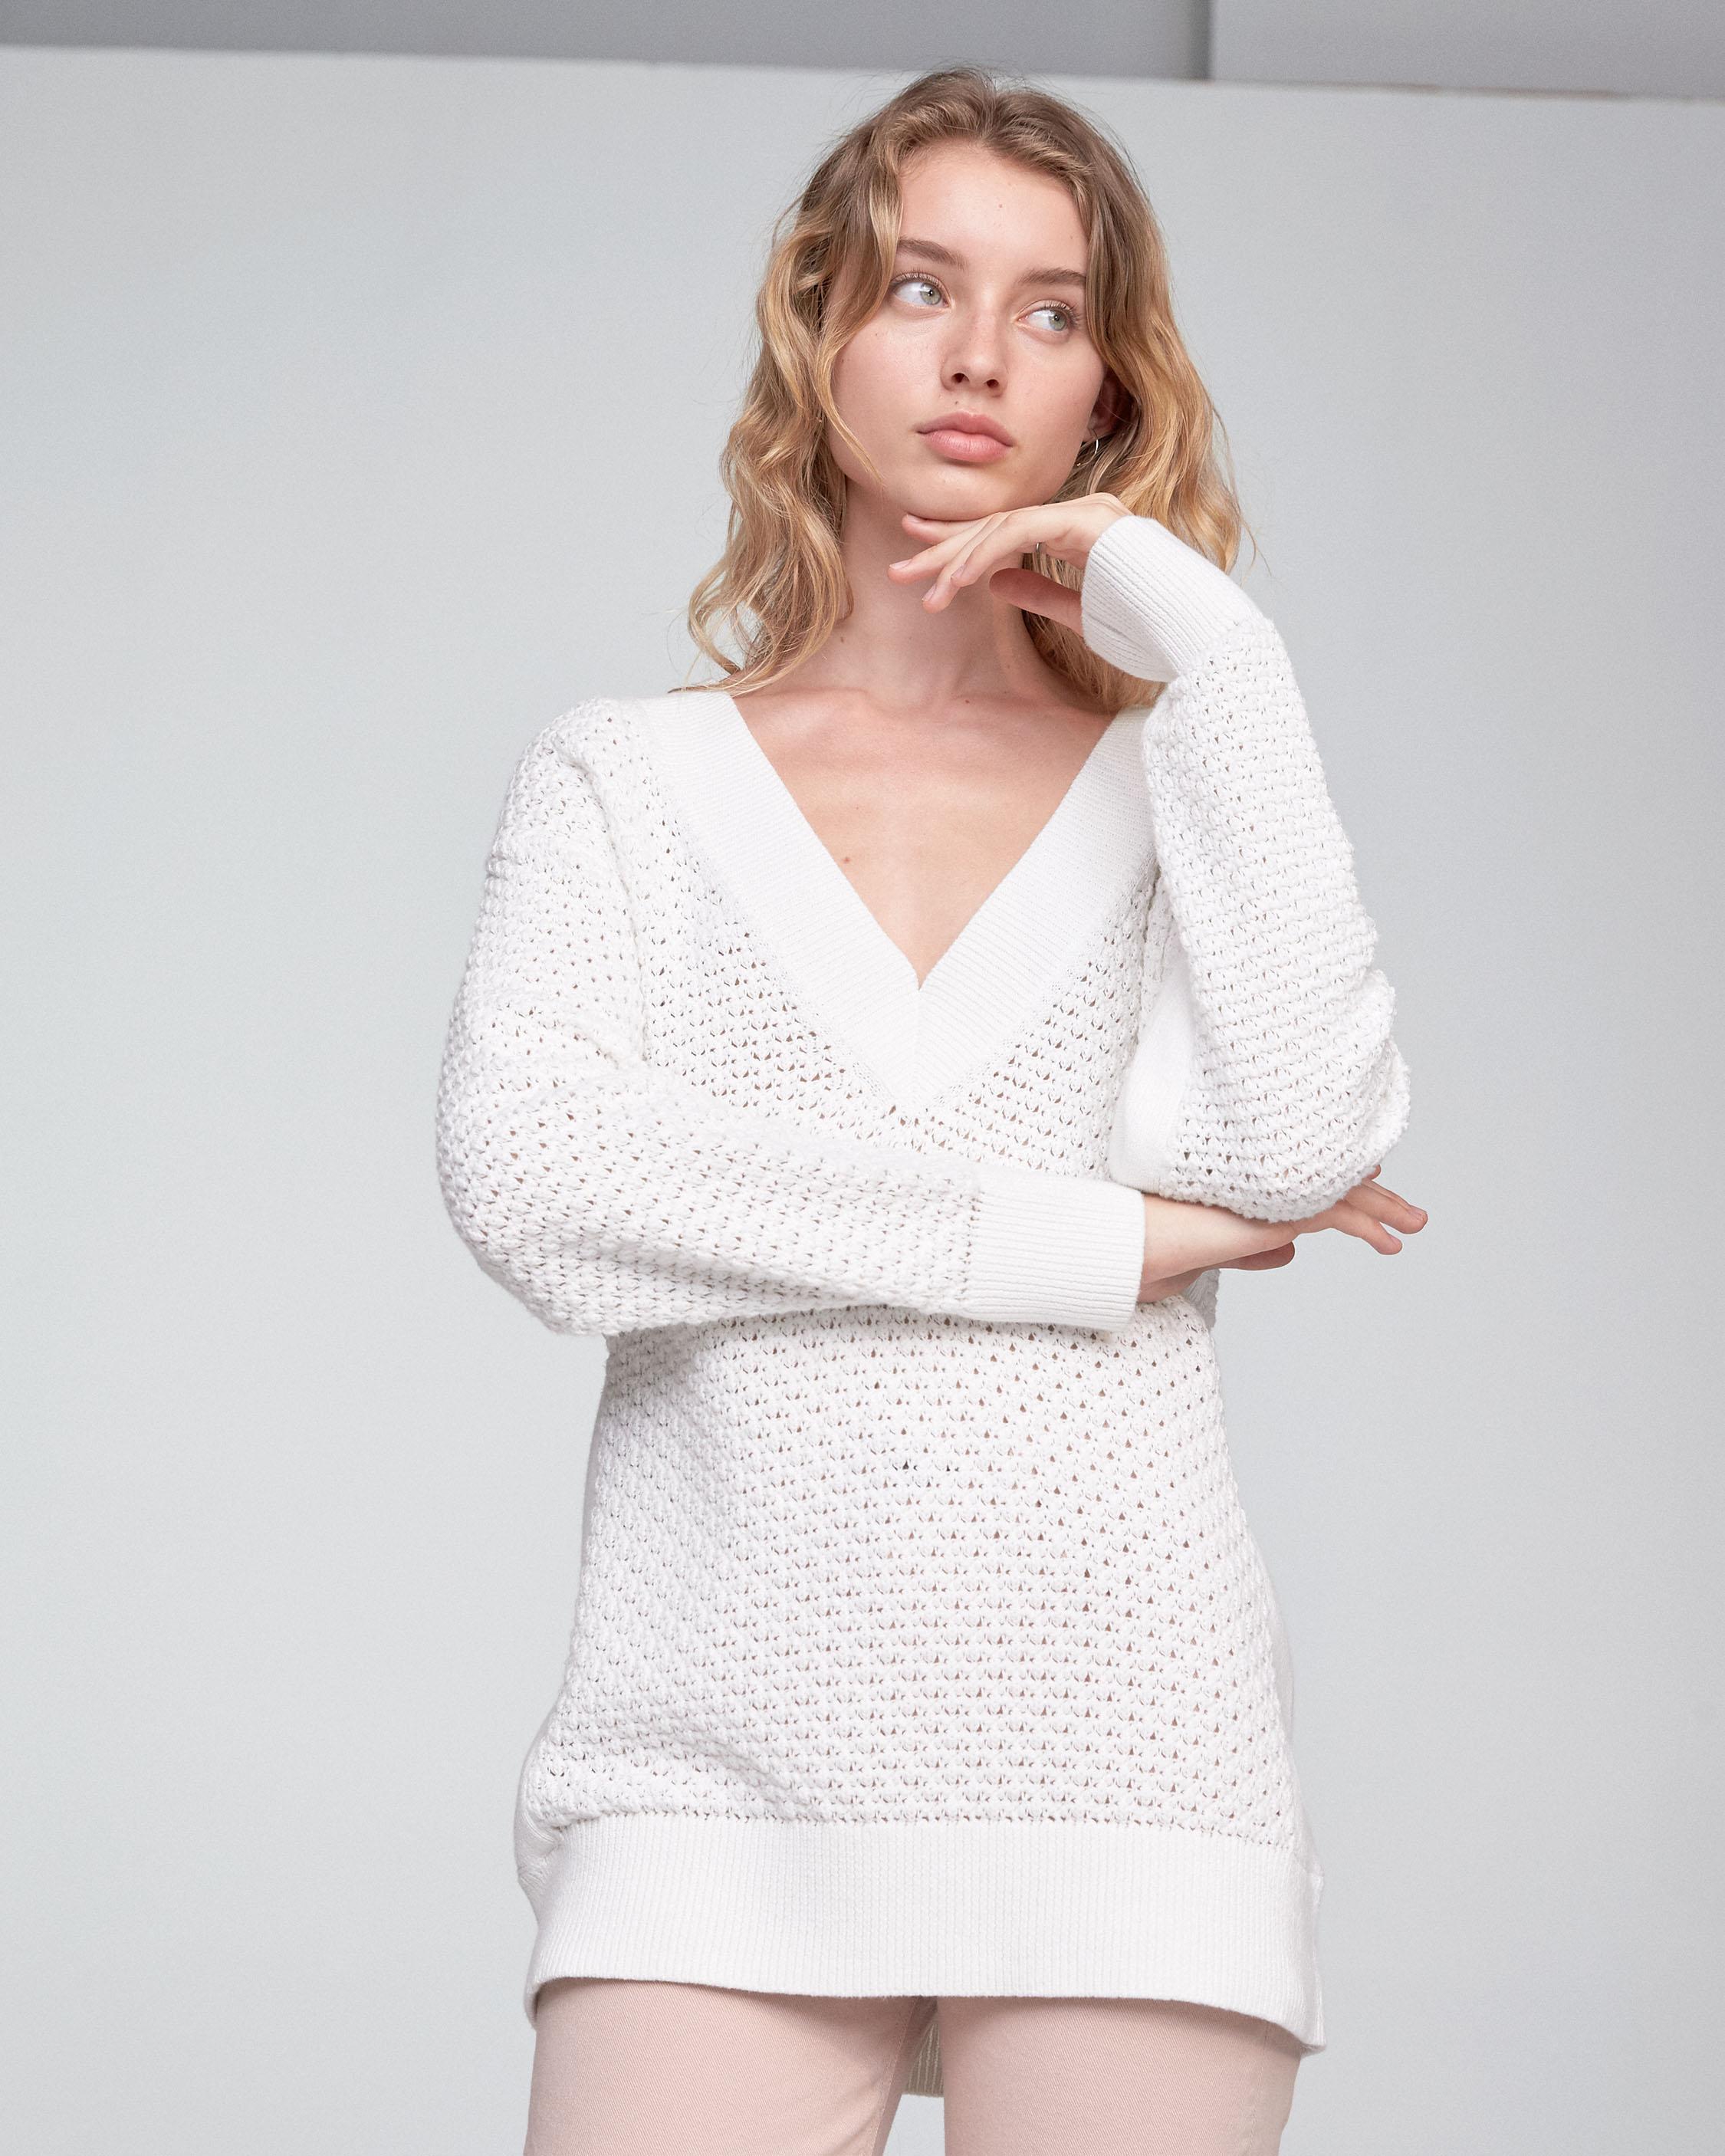 Great Deals White Kyra V-Neck Rag & Bone For Cheap Sale Online hx0pjos